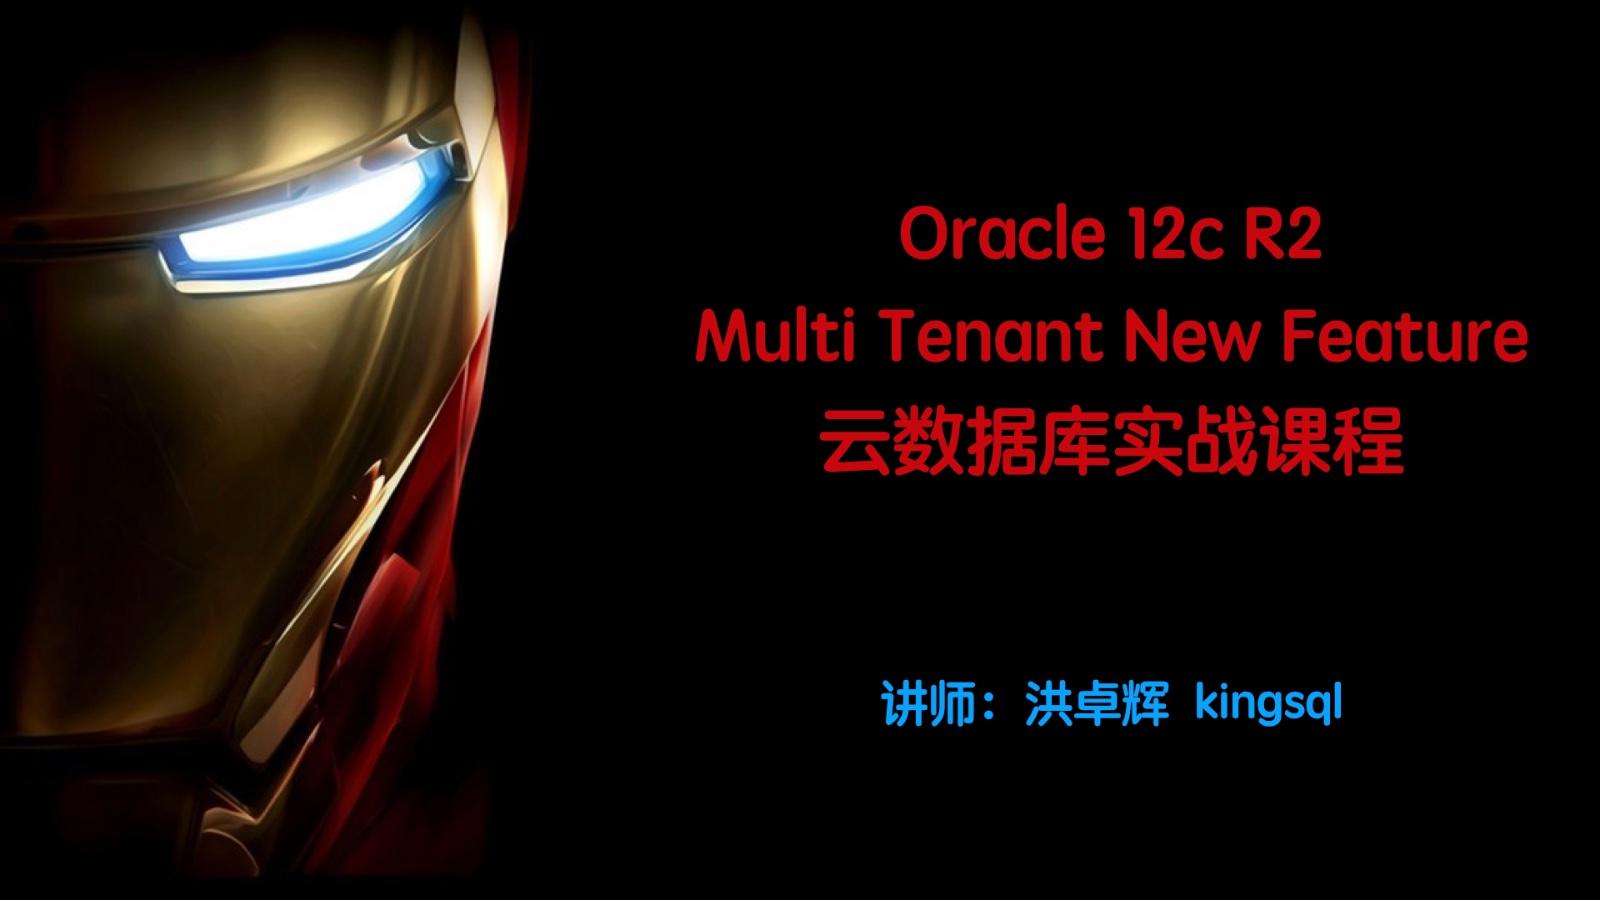 Oracle12cR2云数据库新特性实战视频课程_适合Oracle初、中级工程师_OCP_OCM